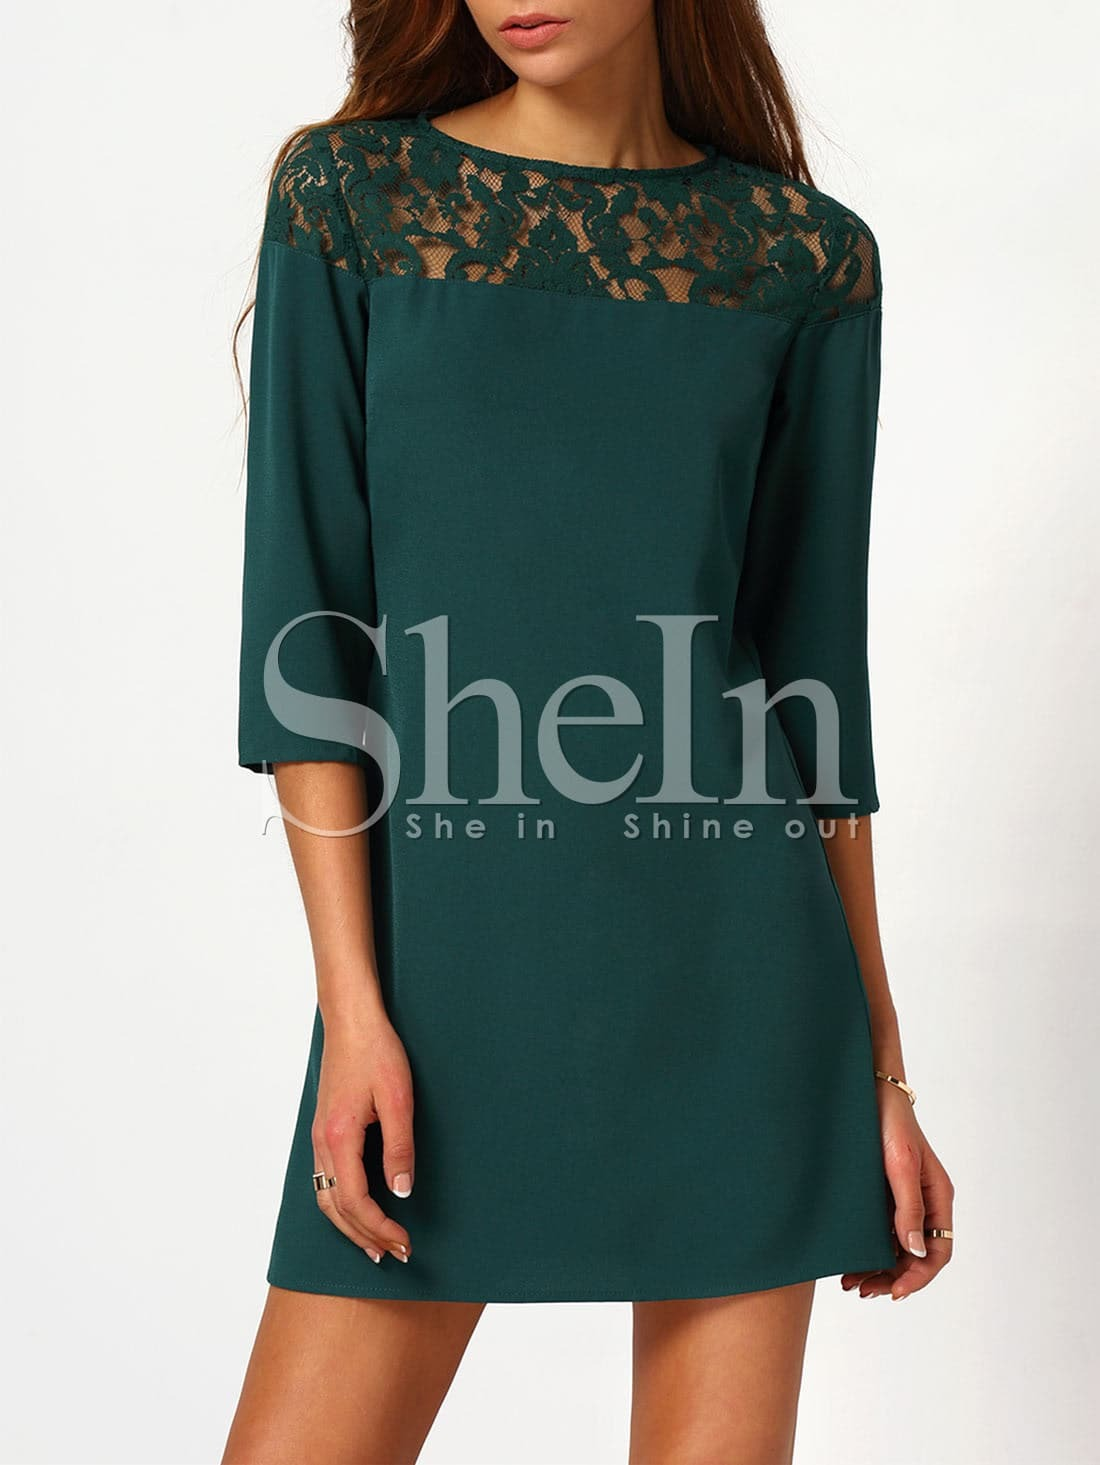 Contrast Lace 3/4 Sleeve Dress dress151028707